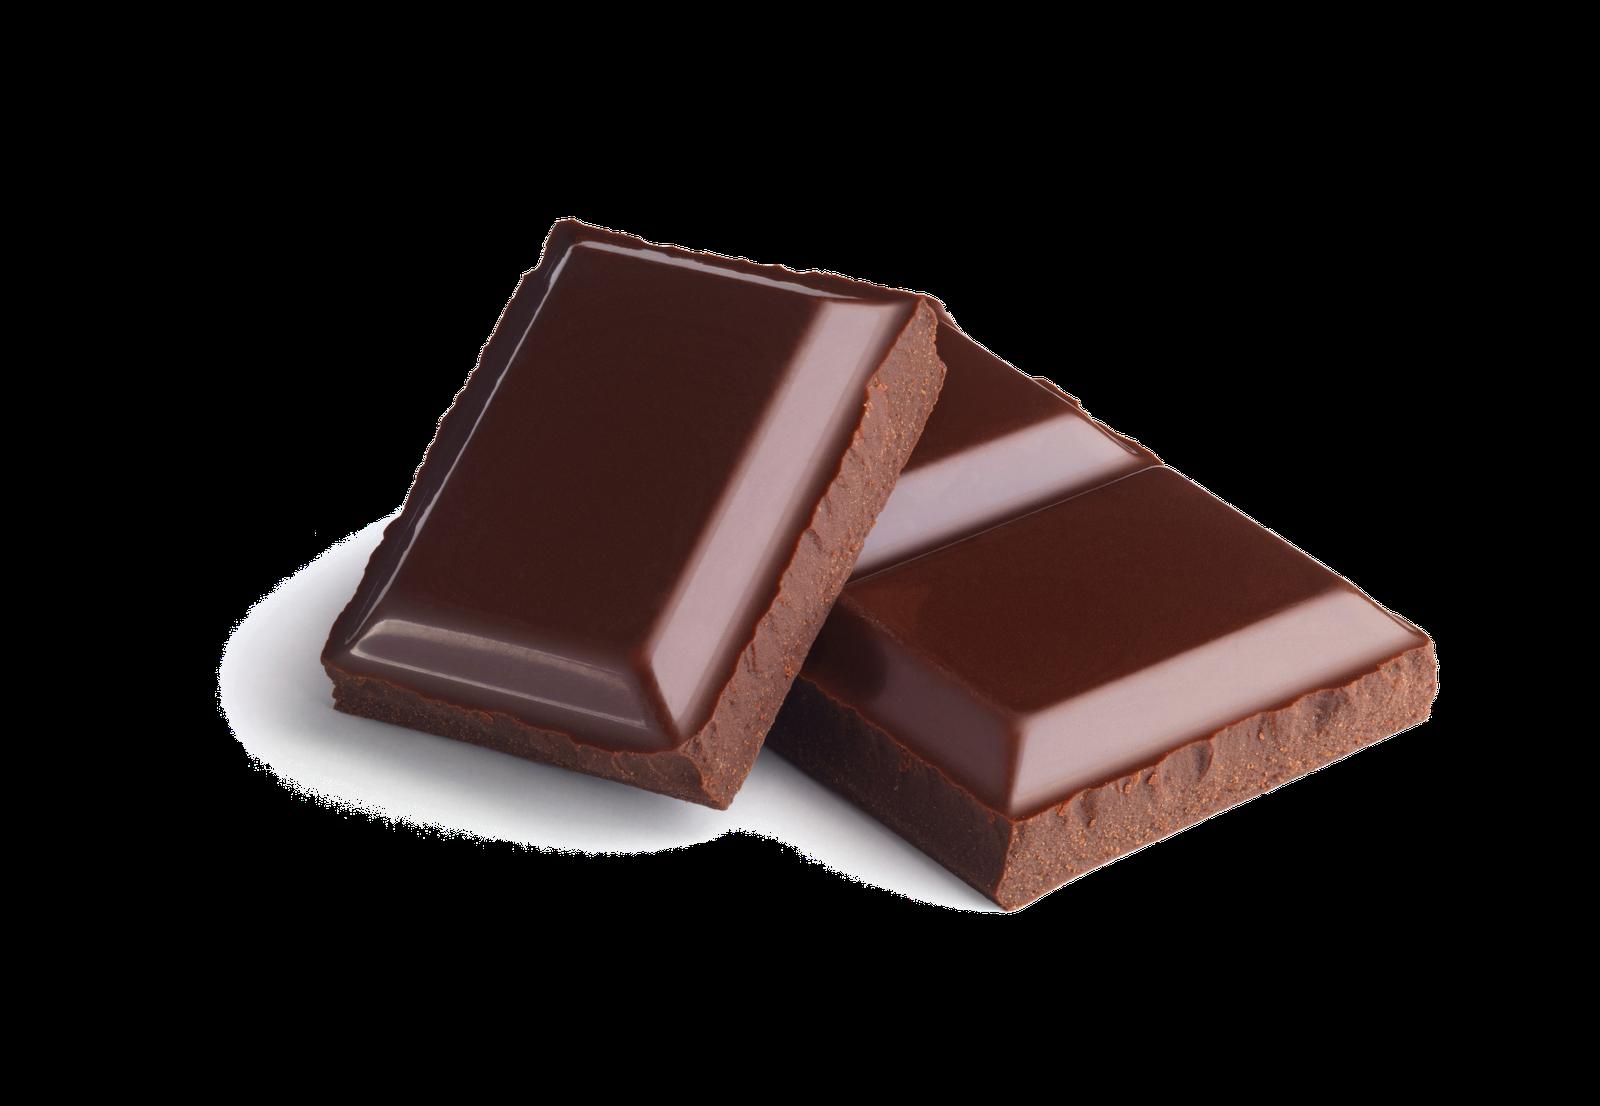 Chocolate PNG image - Chocolate PNG - Chocolate HD PNG